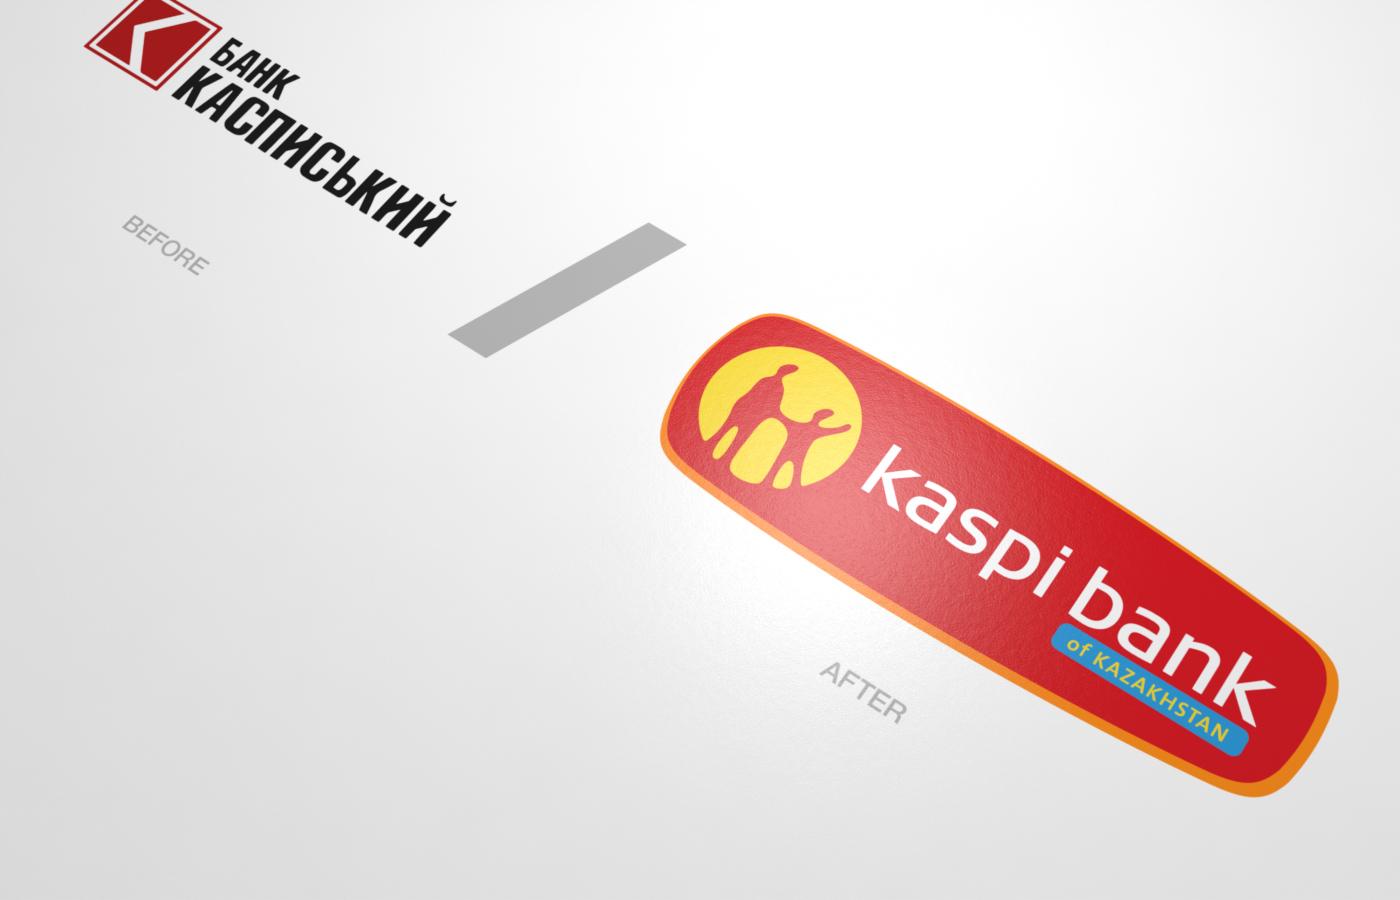 Bank turanalem of Kazakhstan